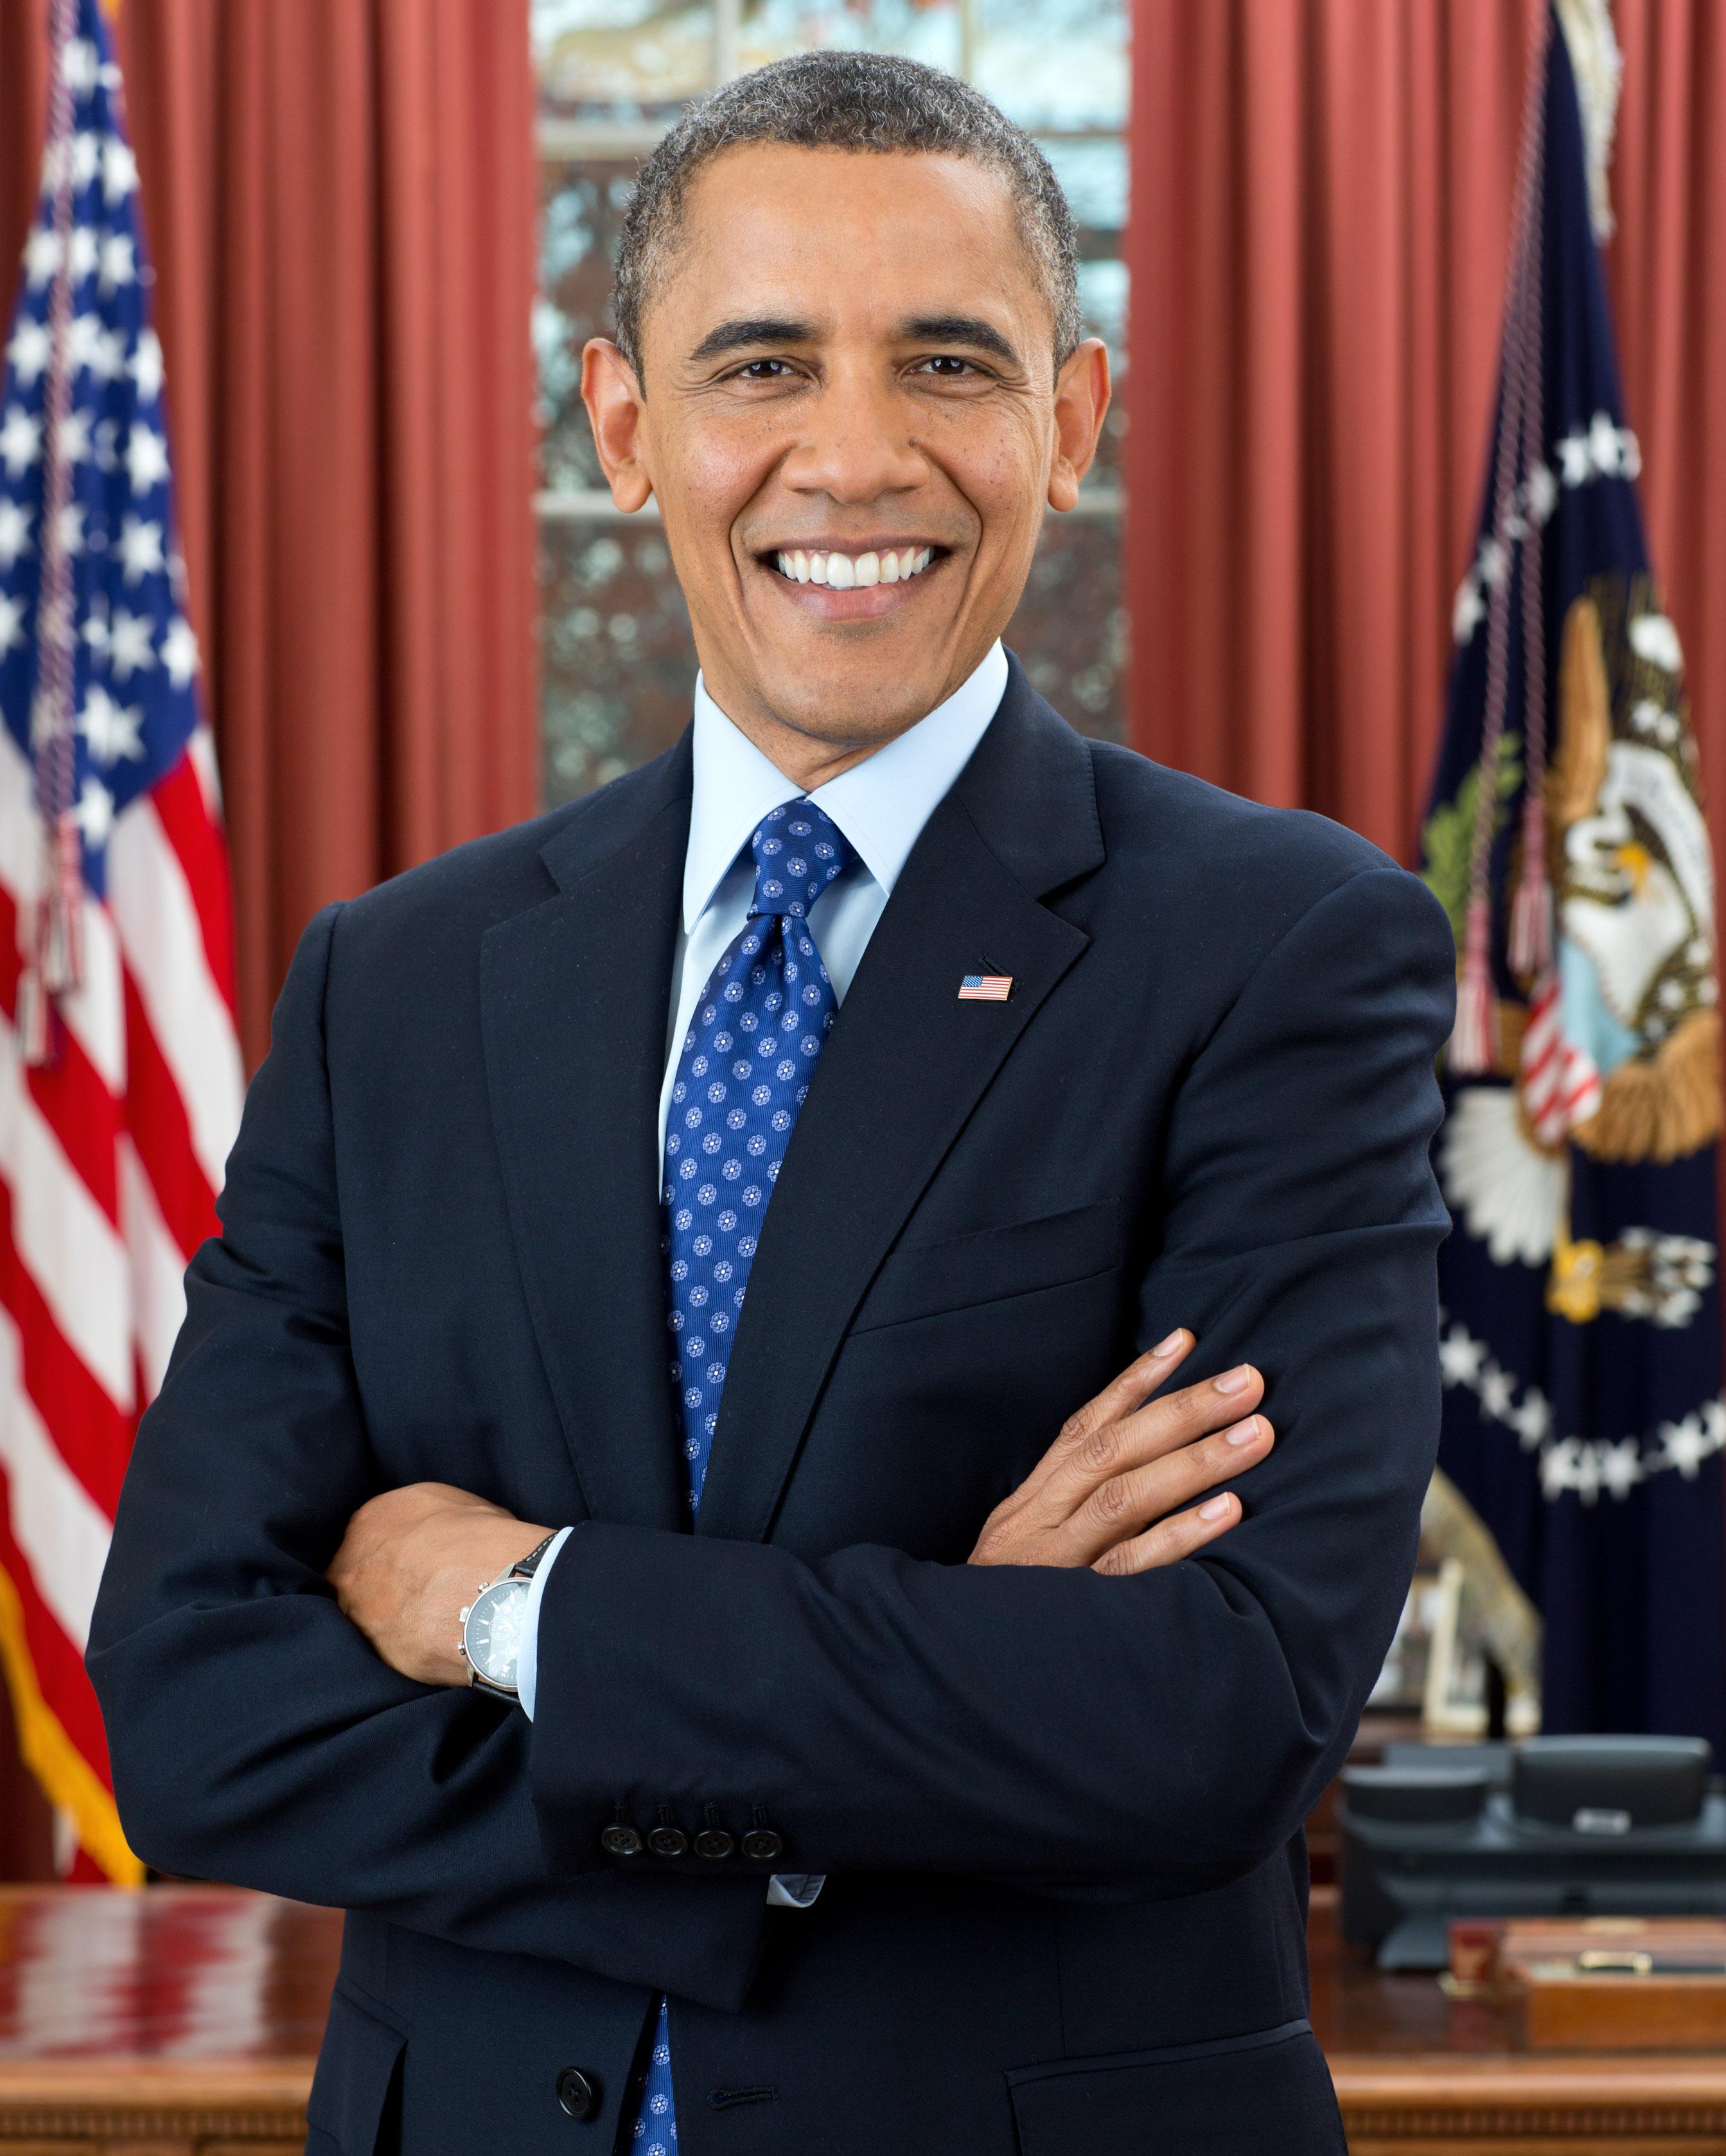 Image: President Barack Obama Official Photo